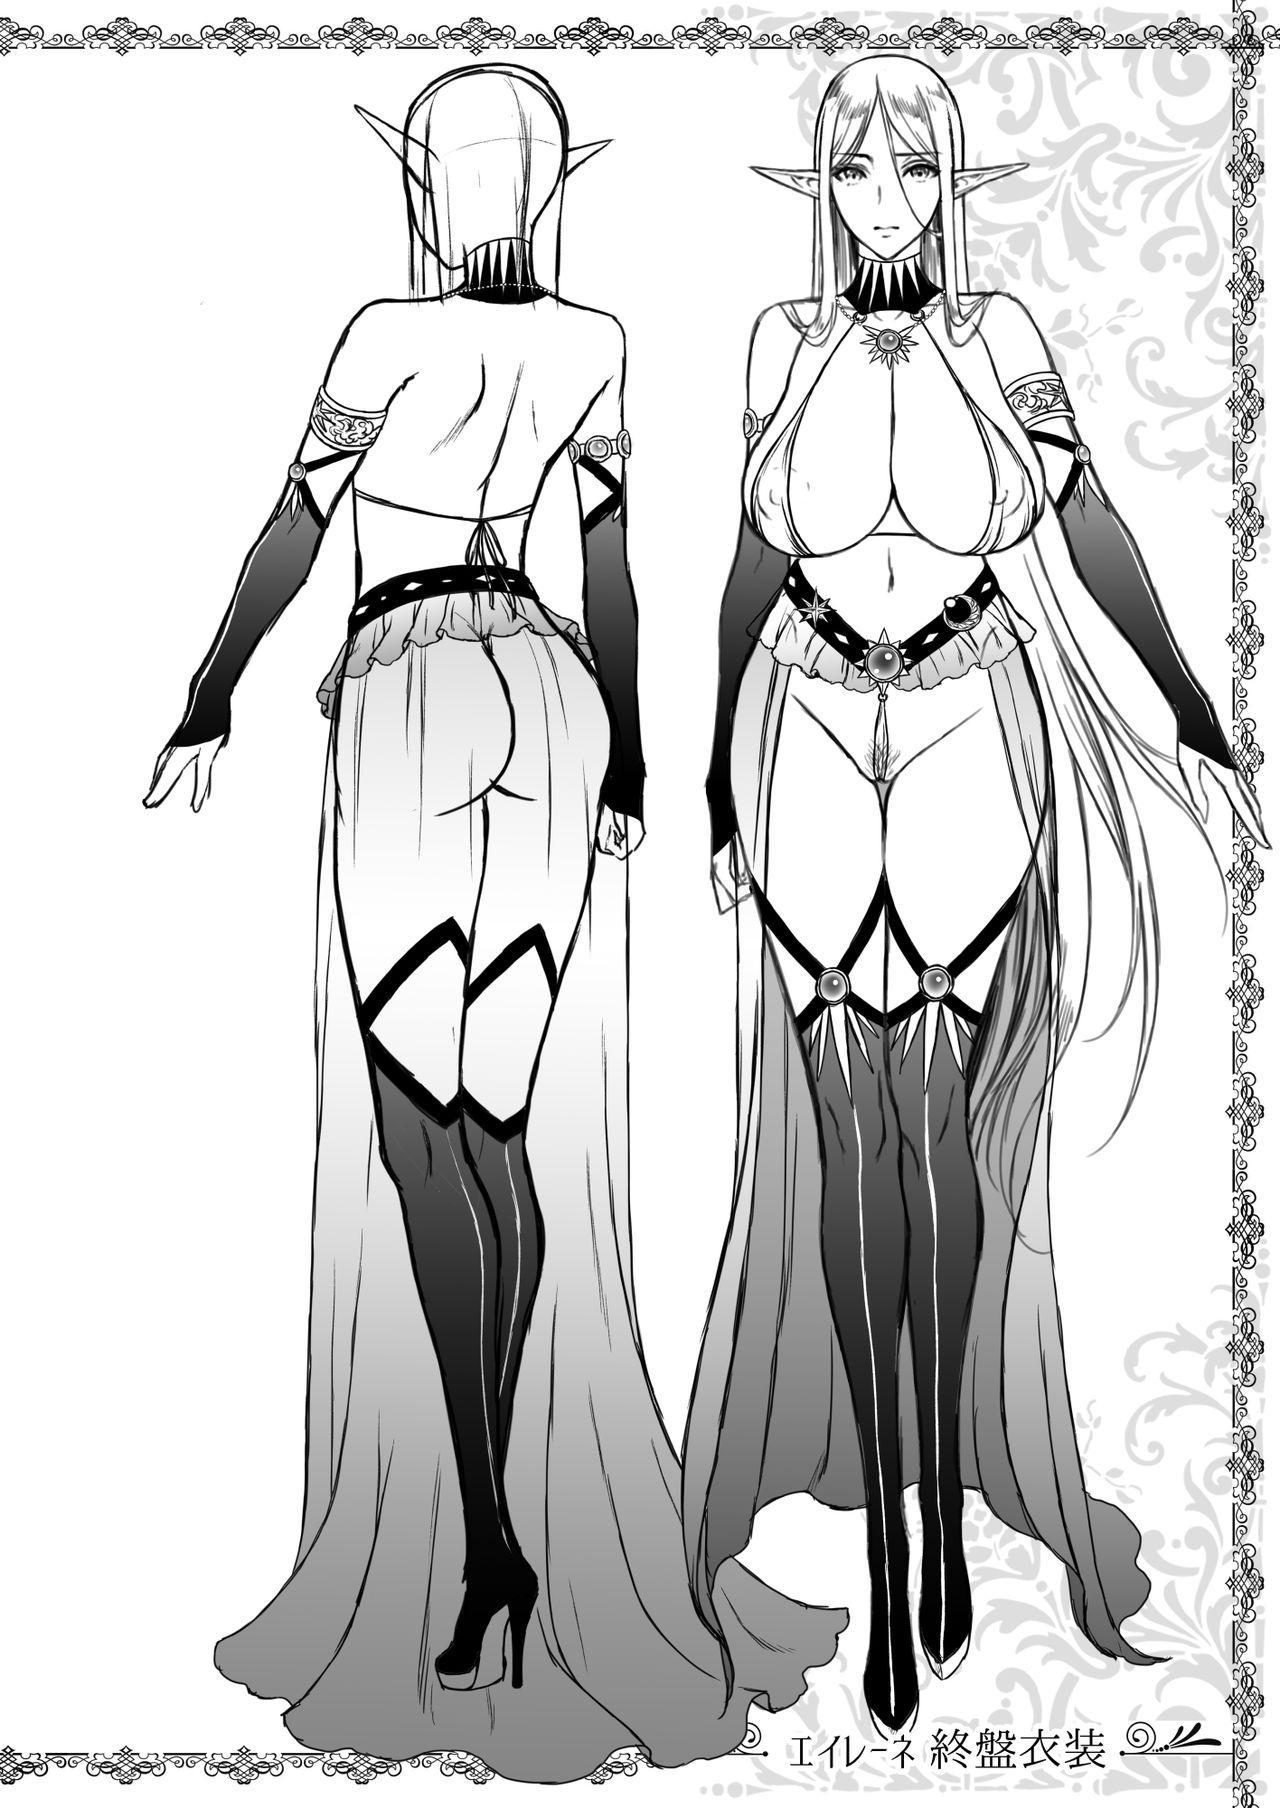 Tasogare no Shou Elf 5 | The Melancholy of the Prostitute Elf 5 38